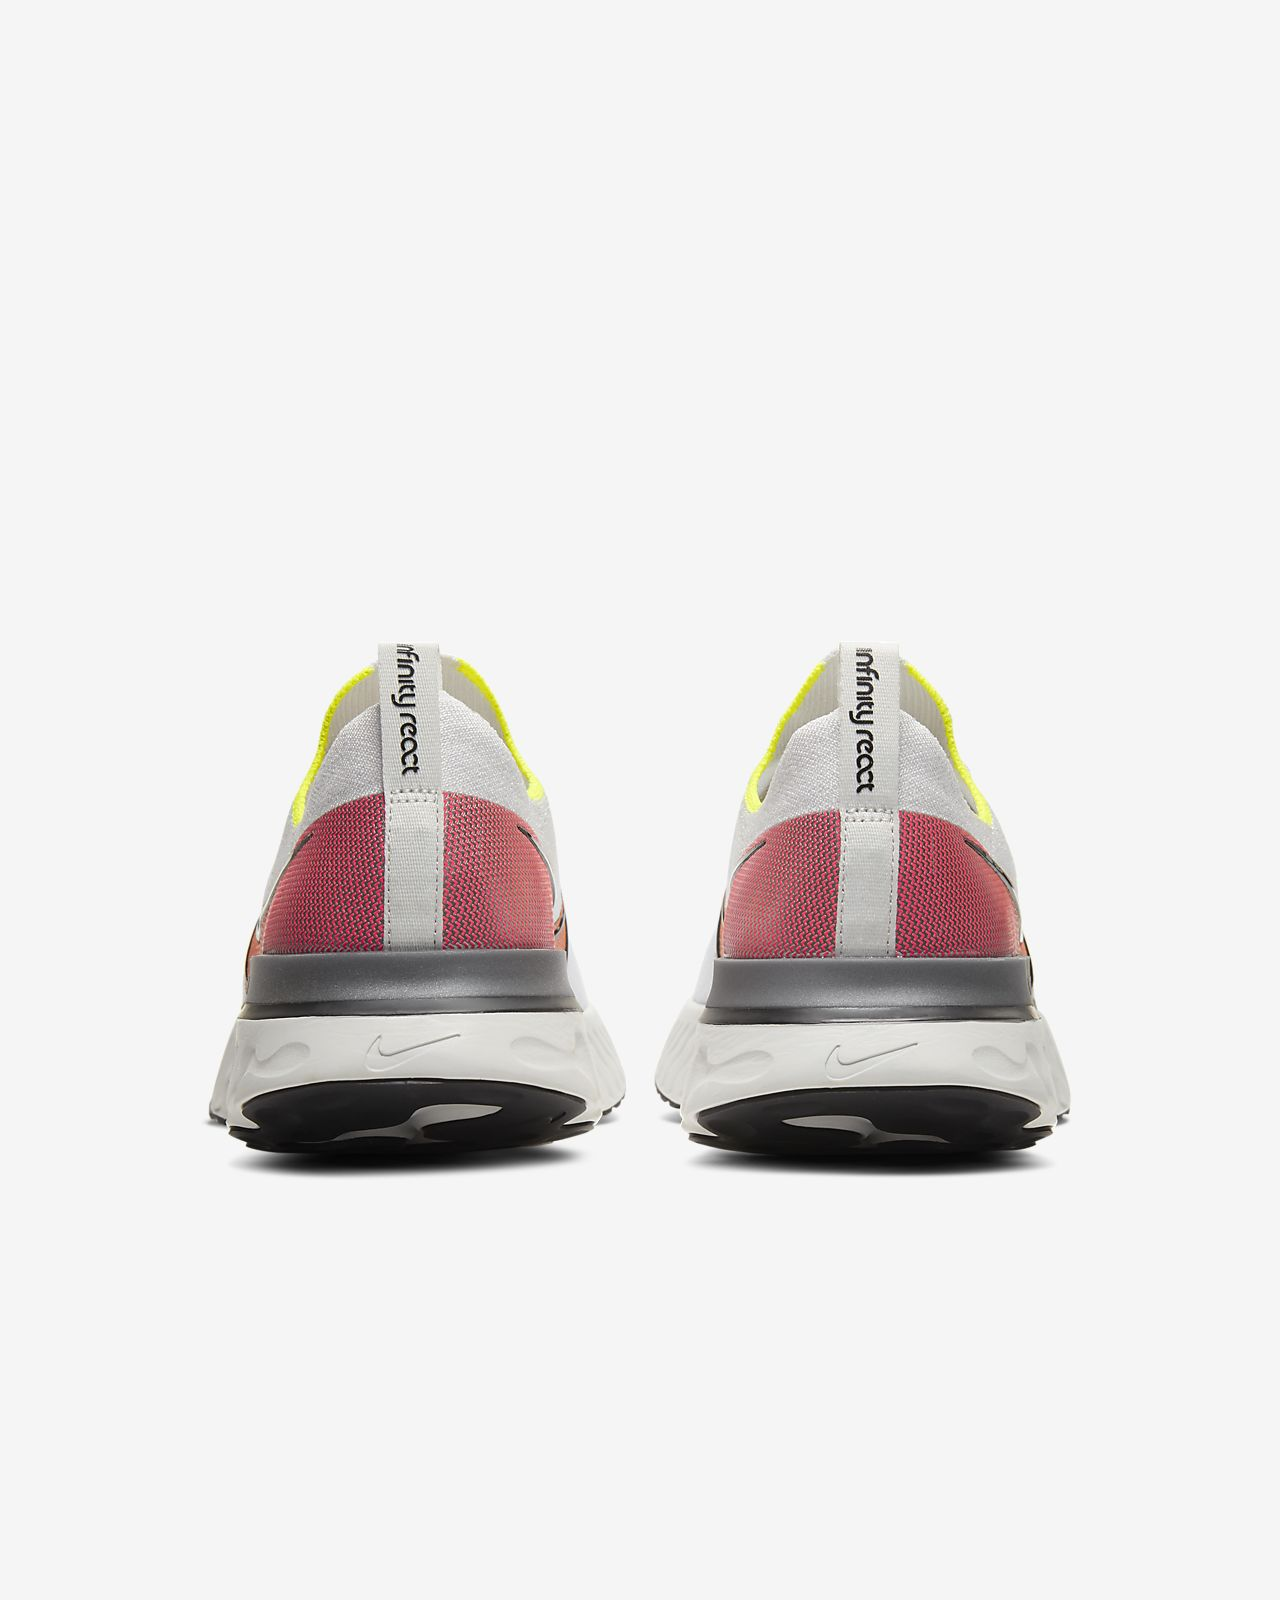 Nike Air Max Plus TN SE Mens WhiteTotal OrangeMetallic